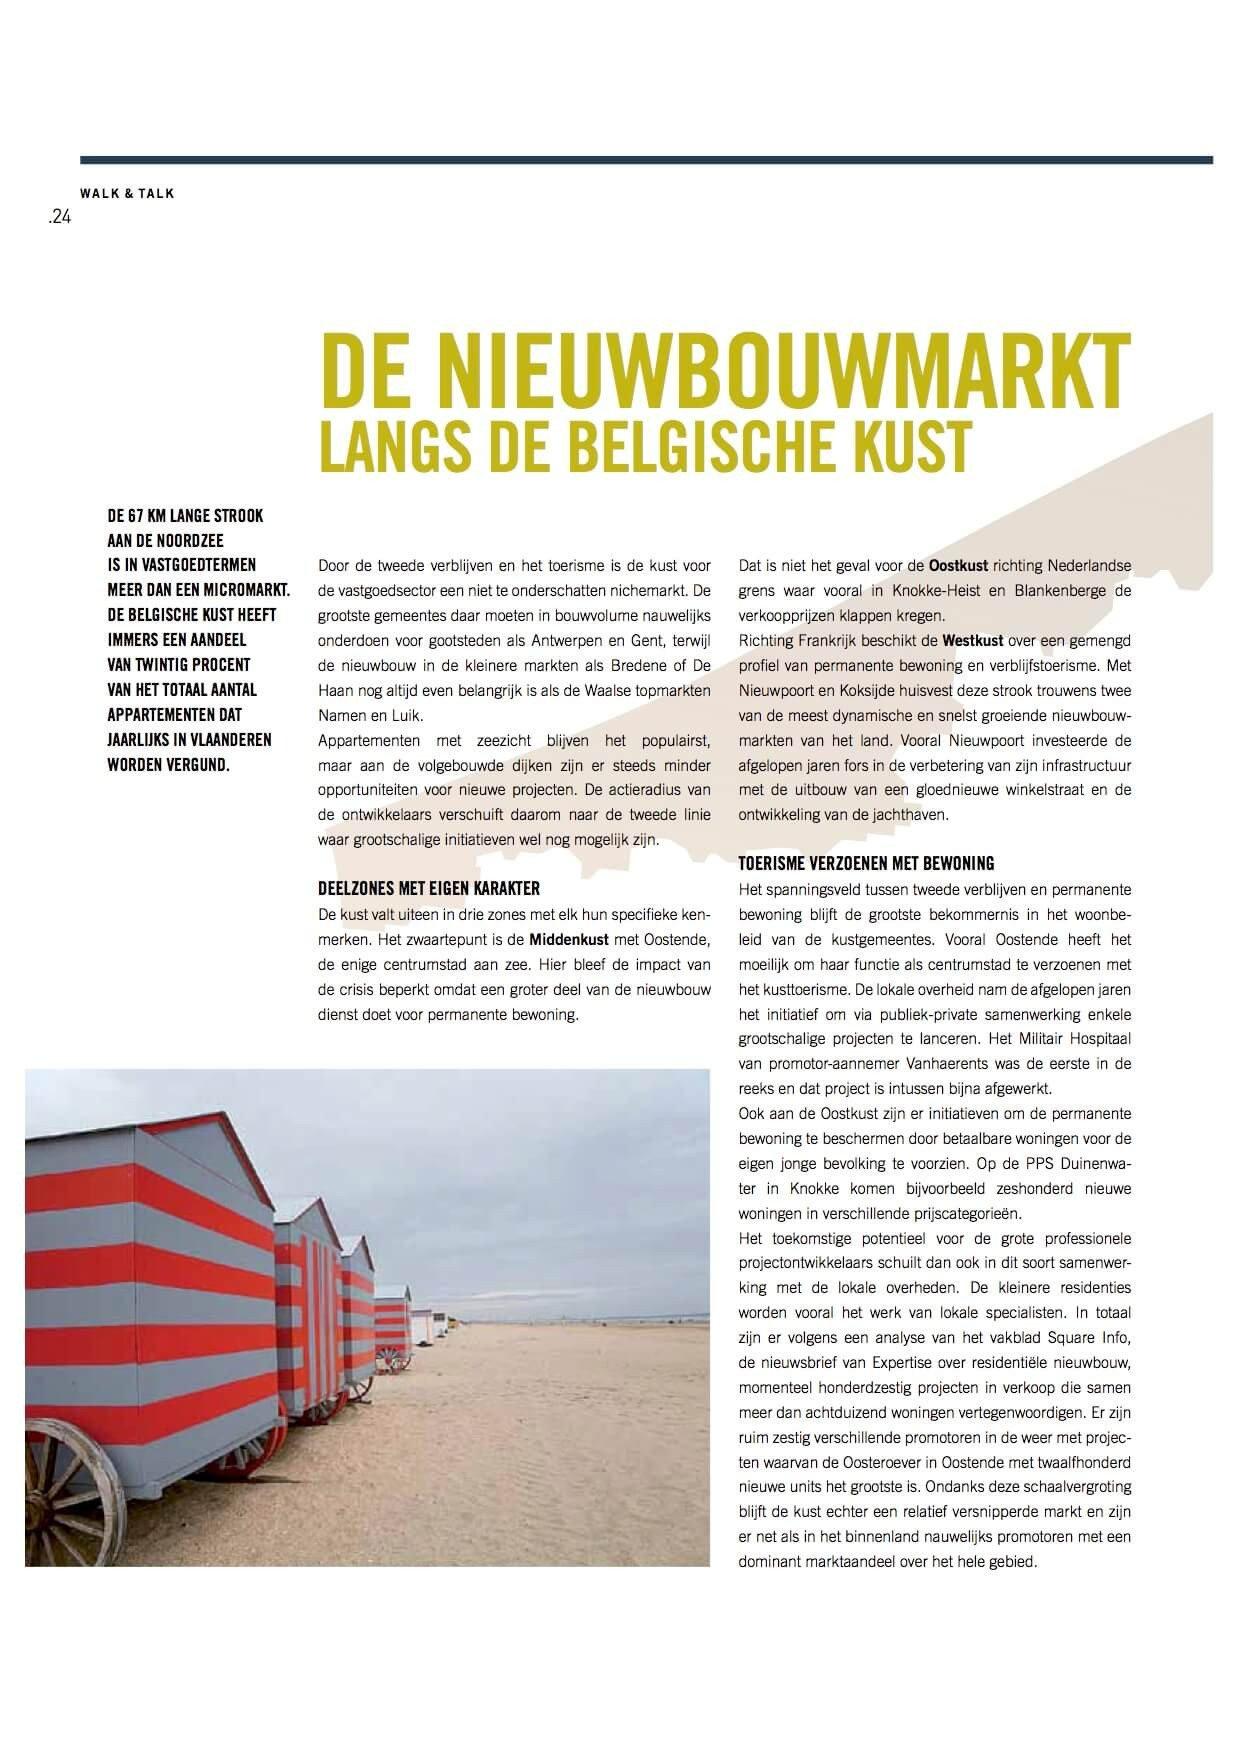 Property Talk - Rietveldprojects 1